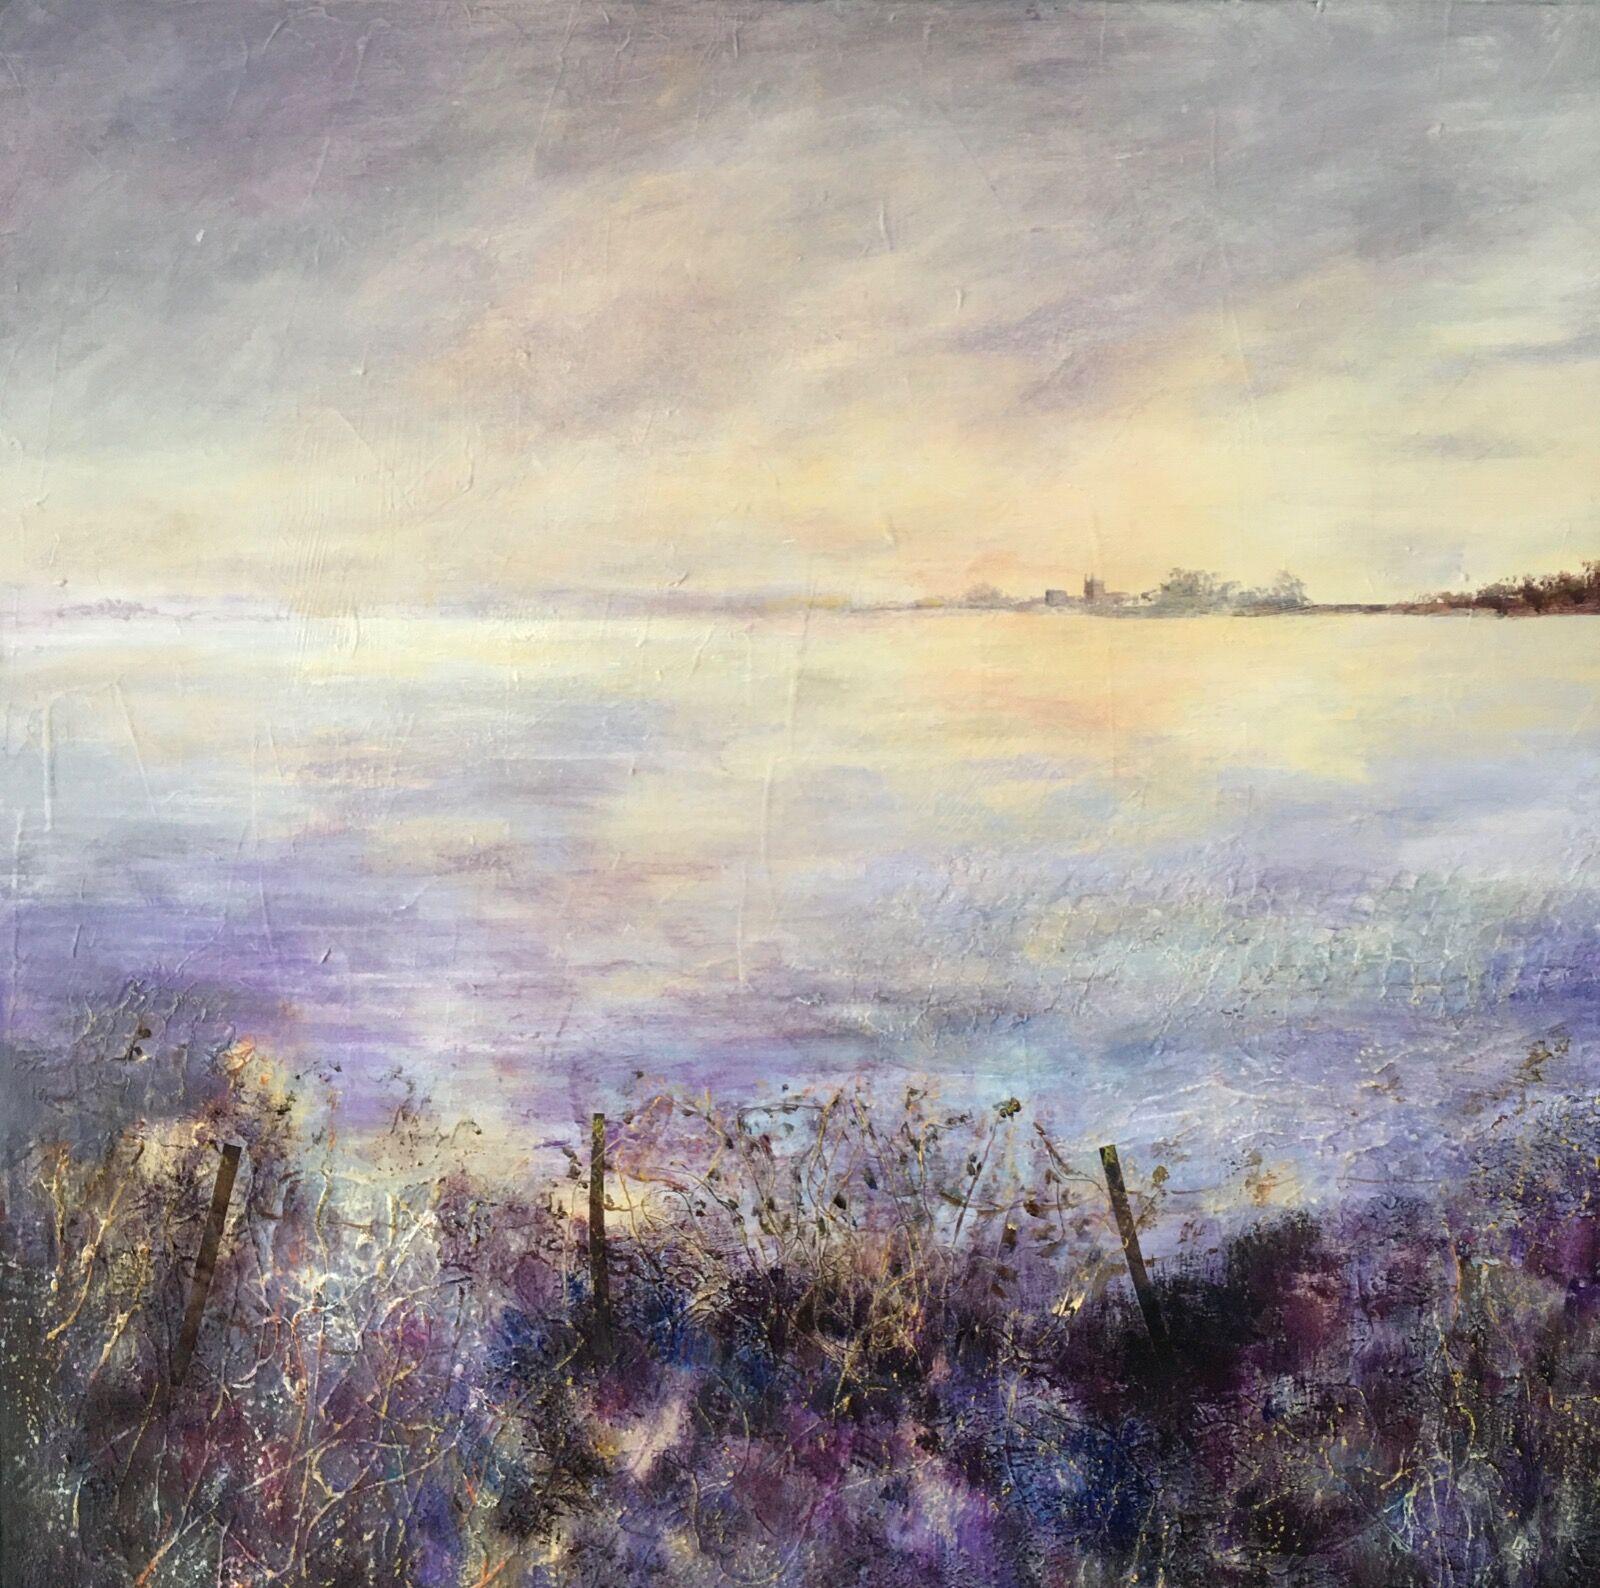 Dawn painting